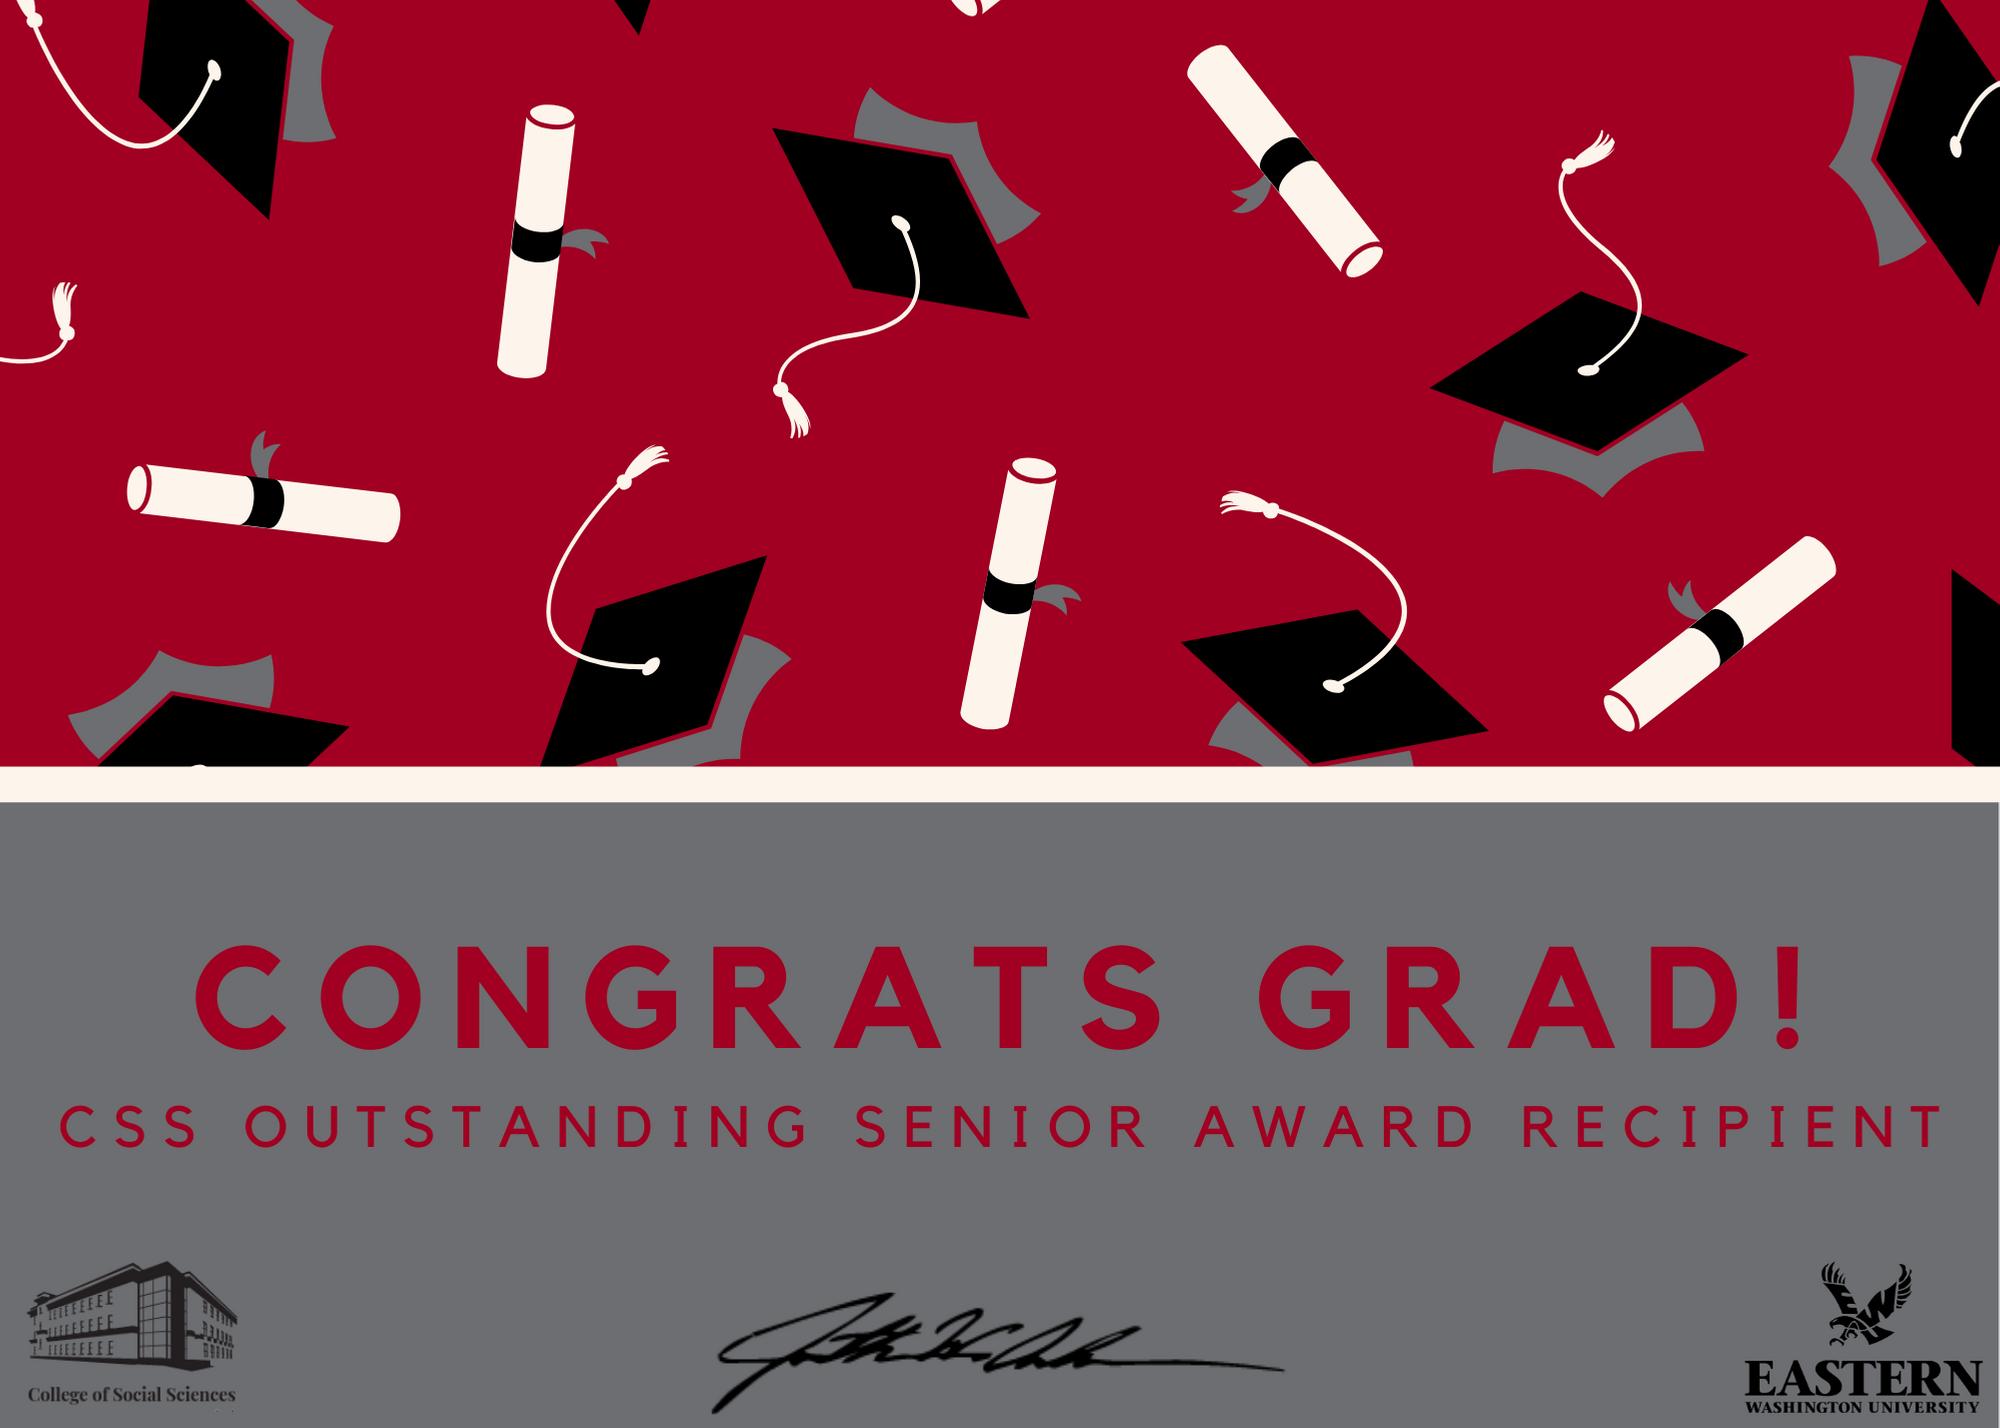 2053-caps-and-diplomas-pattern-graduation-card-2.png